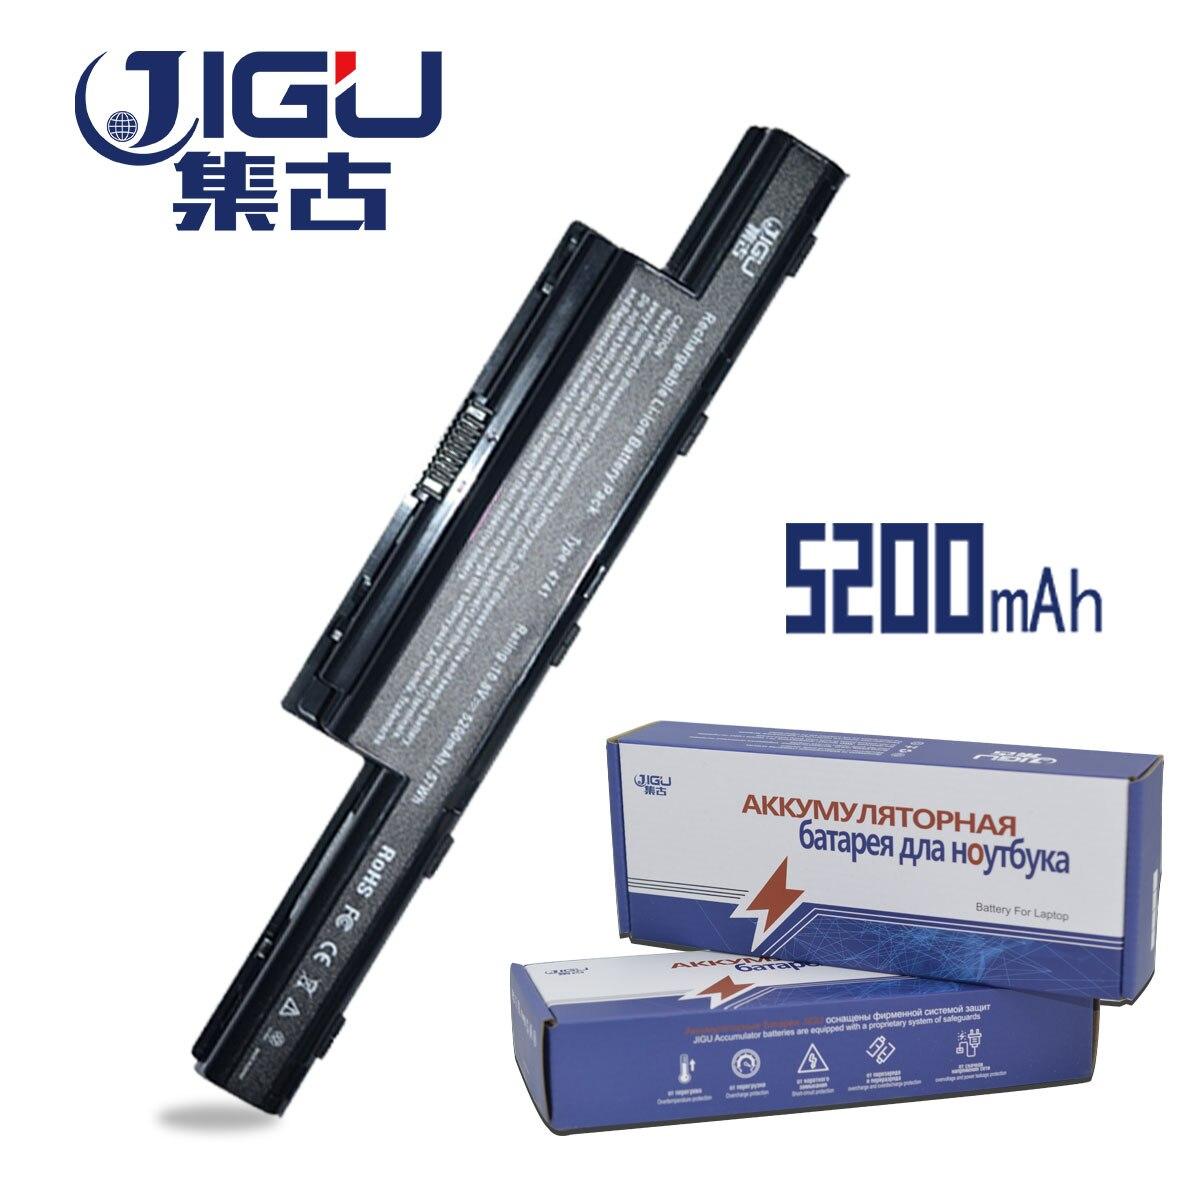 JIGU 7750 г Специальная цена Новый ноутбук Батарея для acer Aspire 5742 5742 г 4741 г 7741 AS10D31 AS10D73 AS10D75 AS10D81 5750 ...